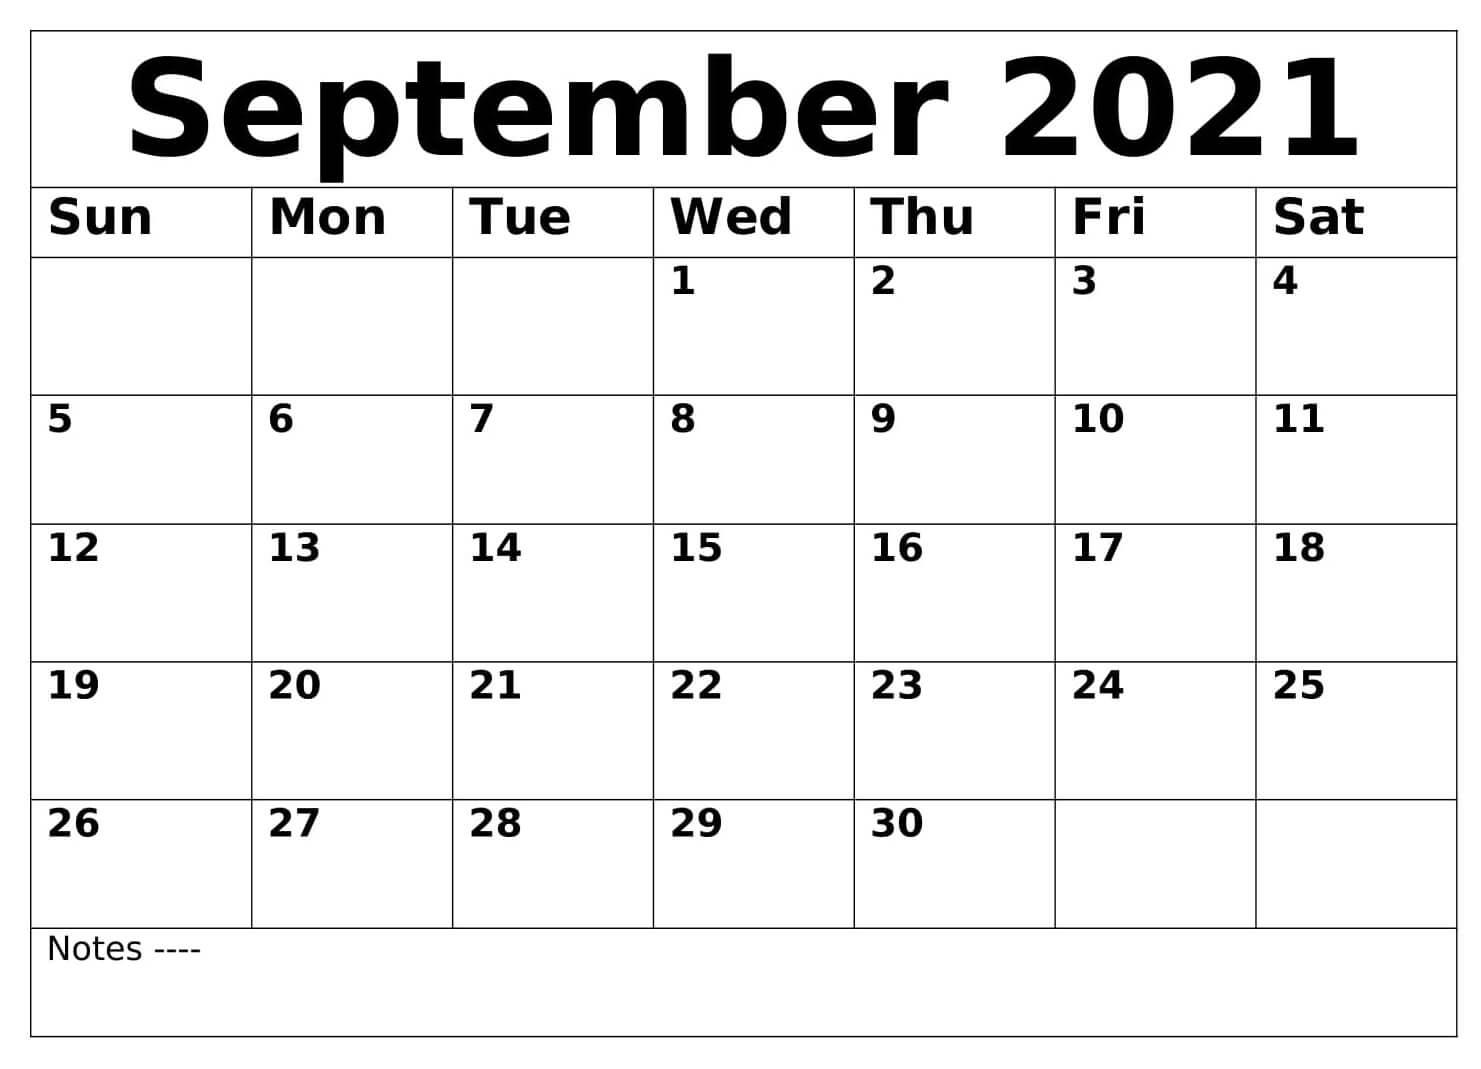 Monthly September 2021 Calendar Printable